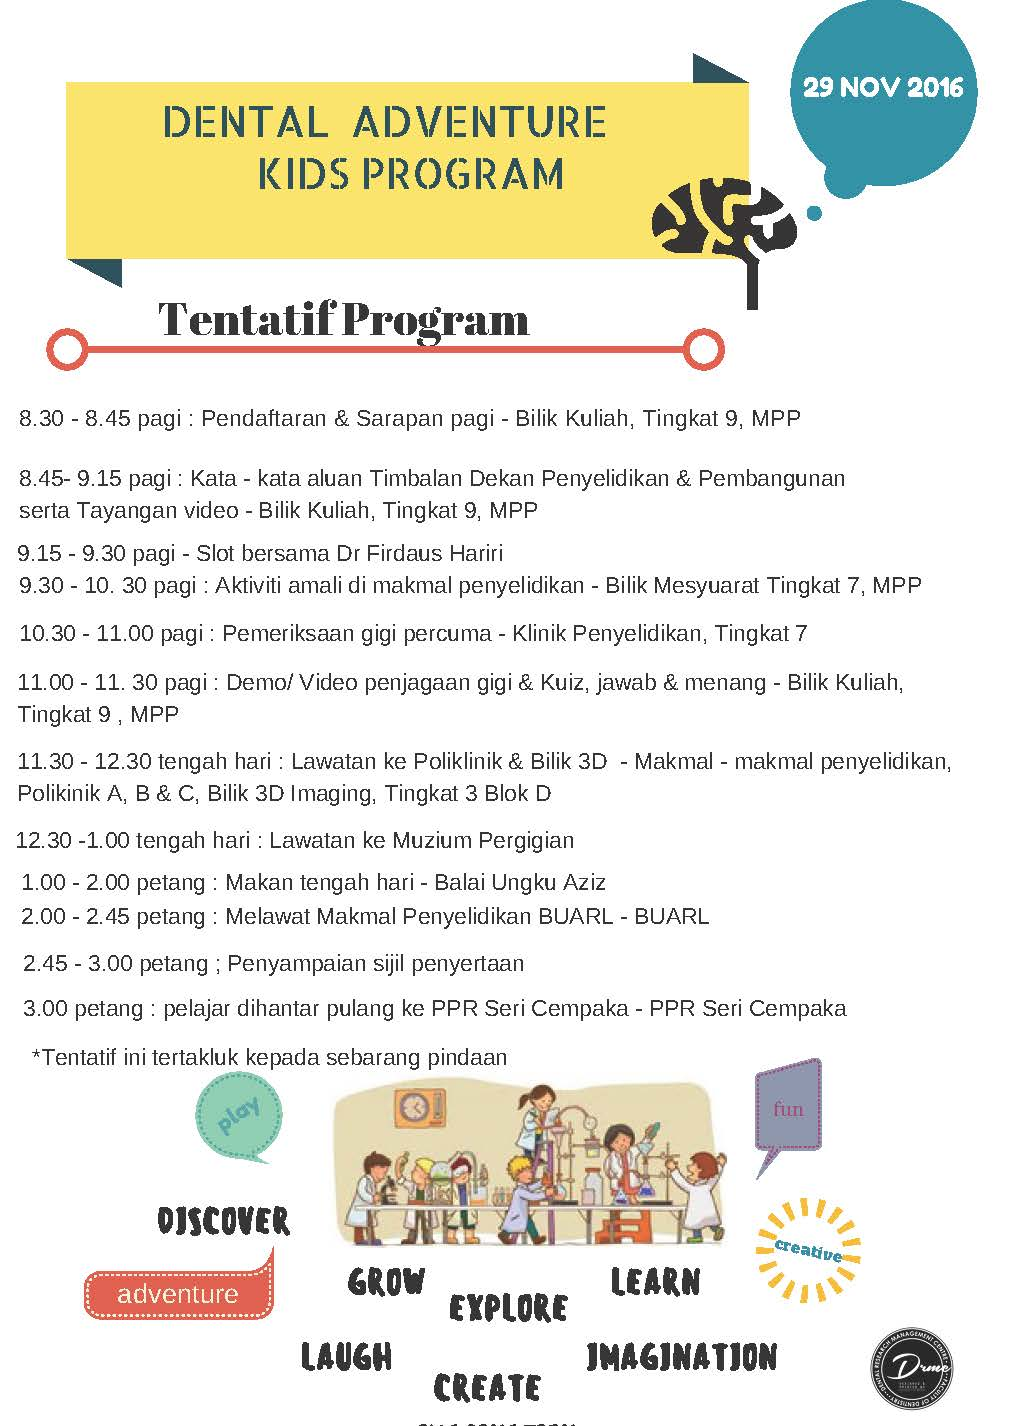 tentative-program-_dakp-1